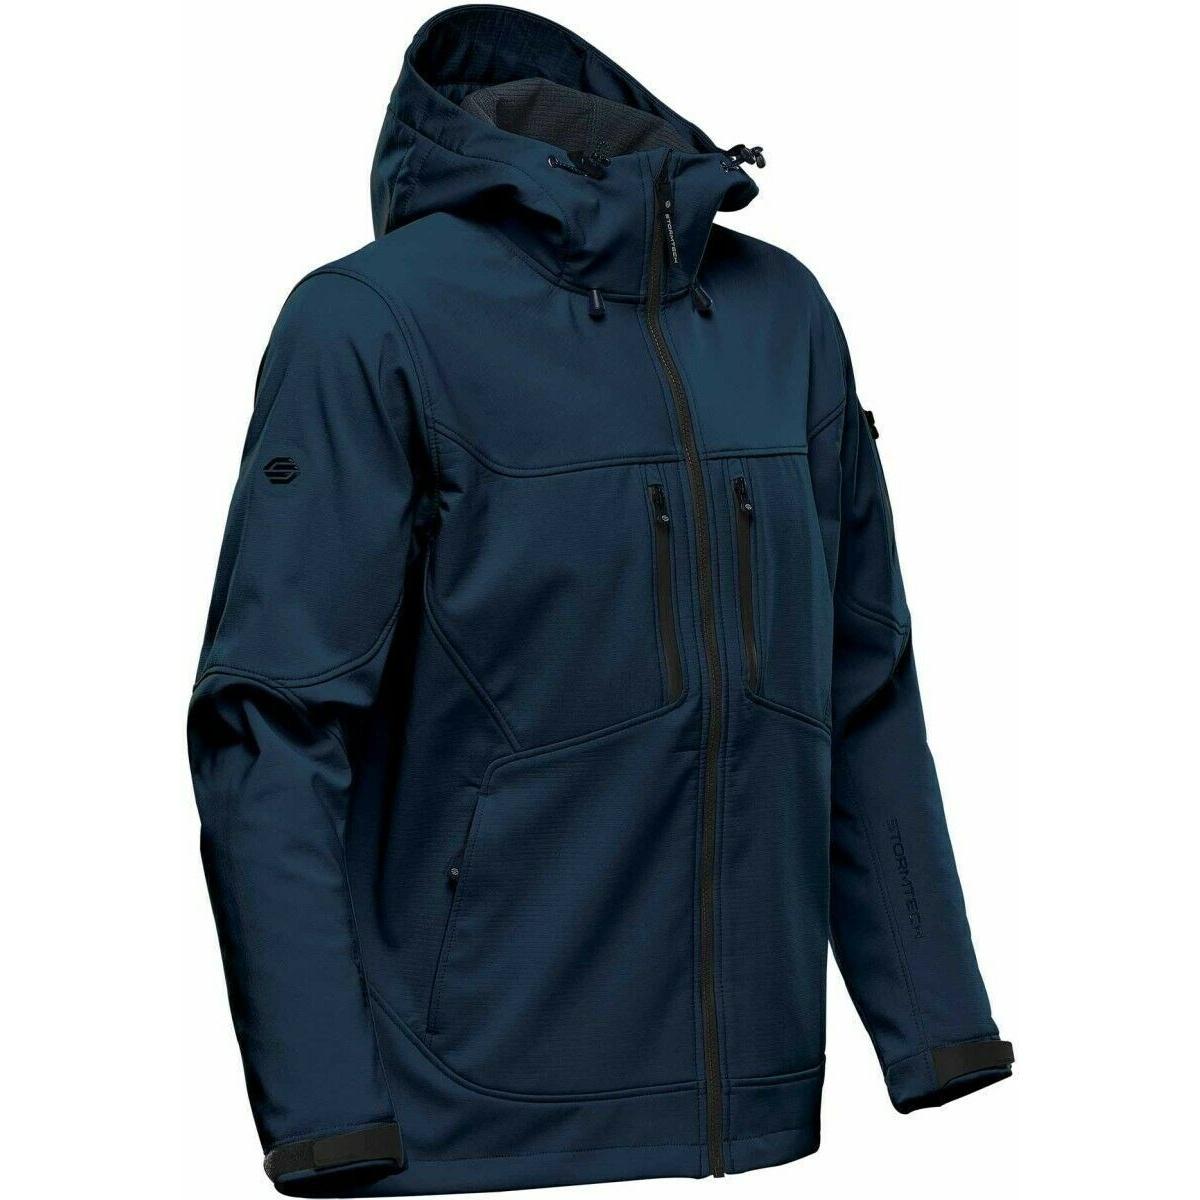 Stormtech Womens/Ladies Epsilon 2 Soft Shell Jacket (S) (Black/Graphite)